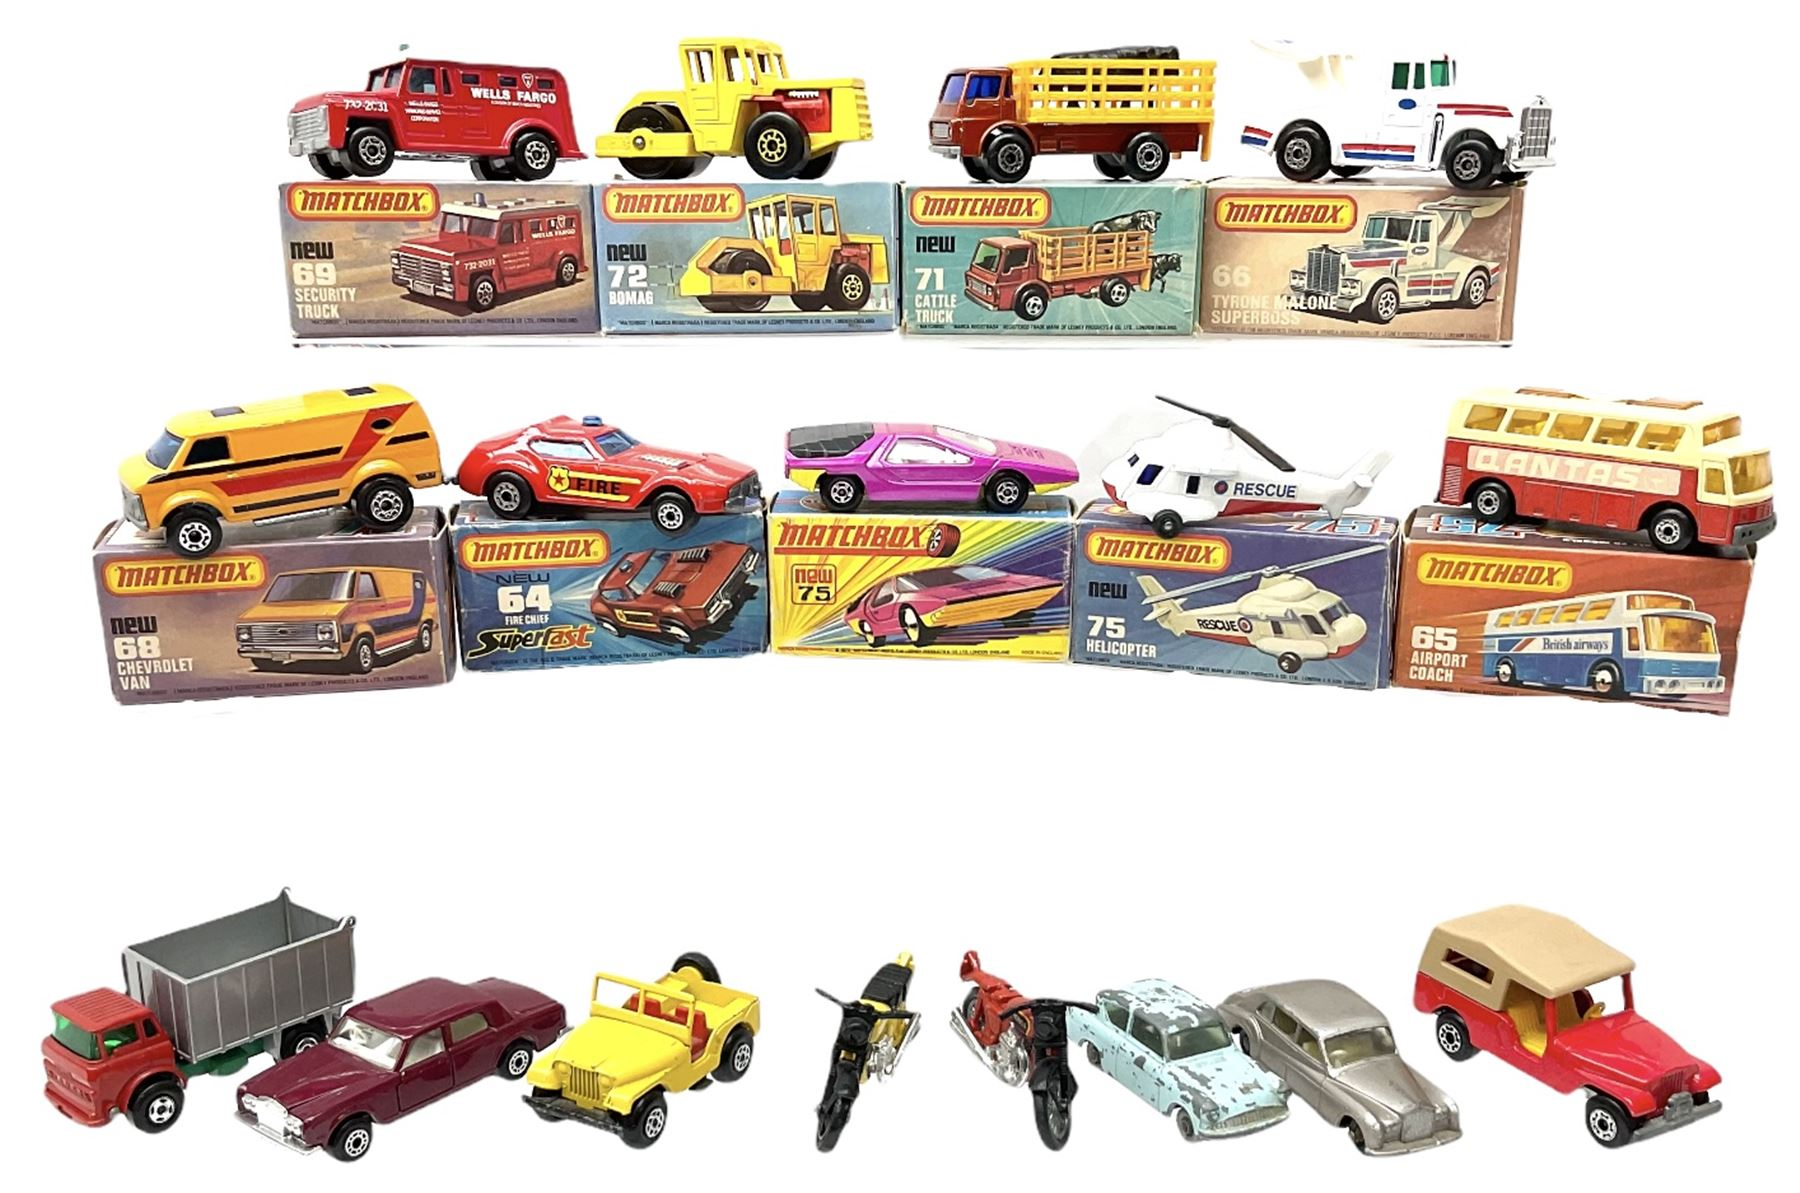 Matchbox/Superfast - nine '1-75' series models comprising 64d Fire Chief car